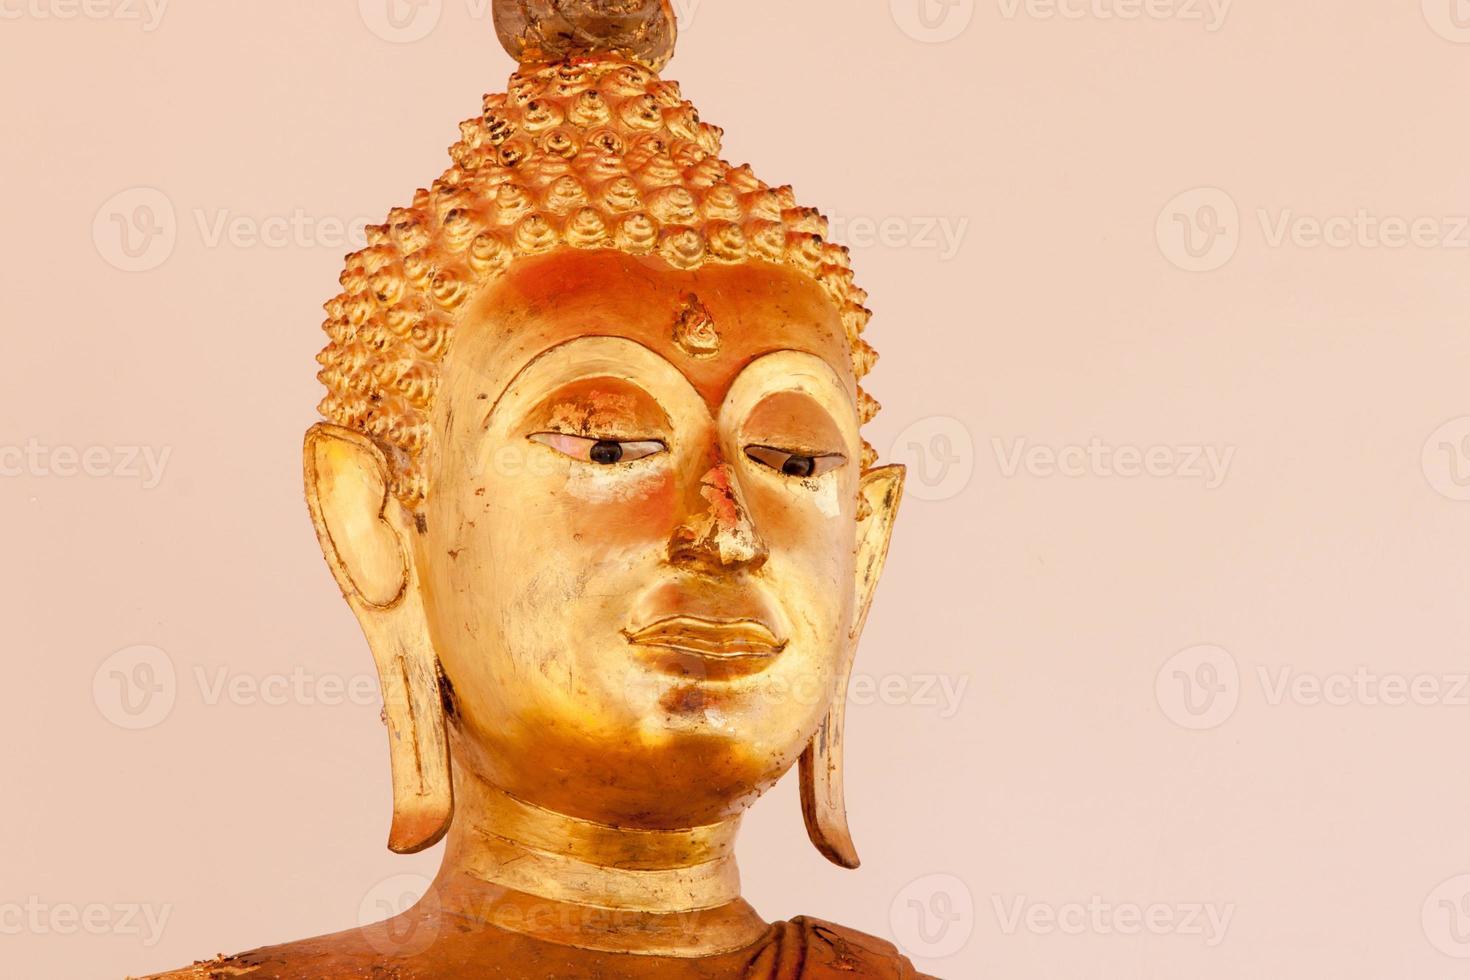 Buddha statue oblique angle photo